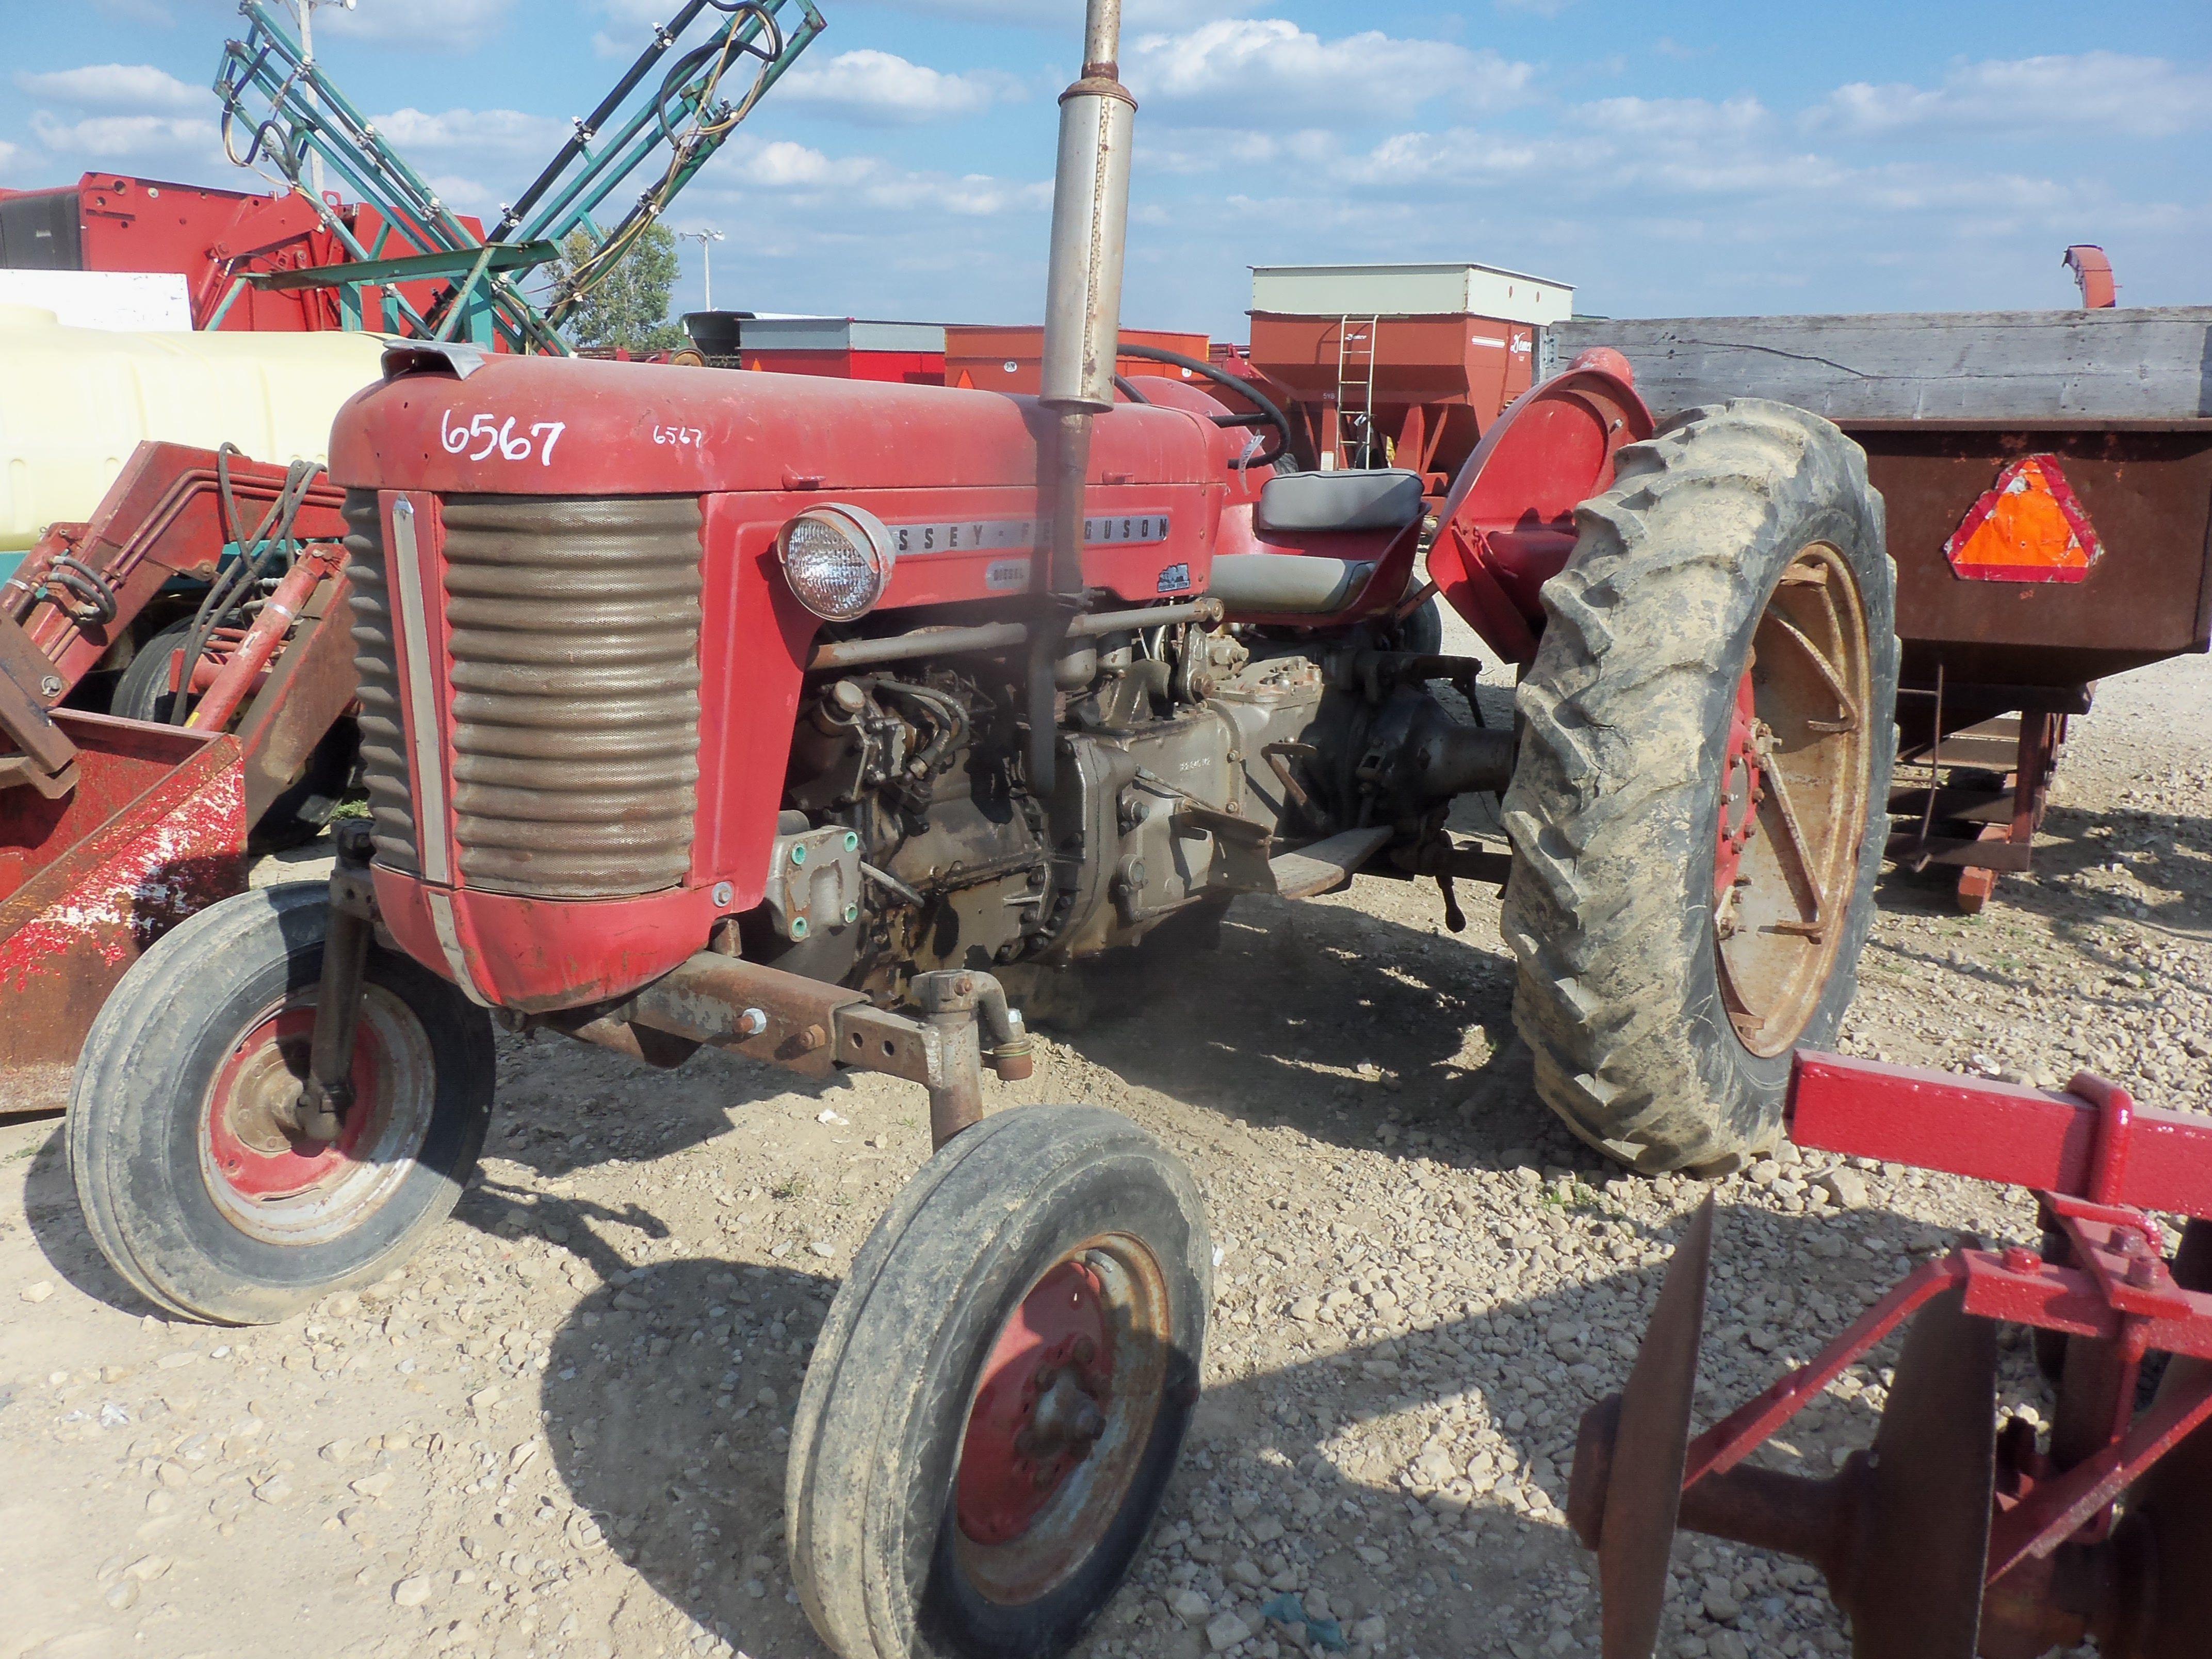 Massey Ferguson 65 Tractors Old Farm Equipment Vintage Tractors